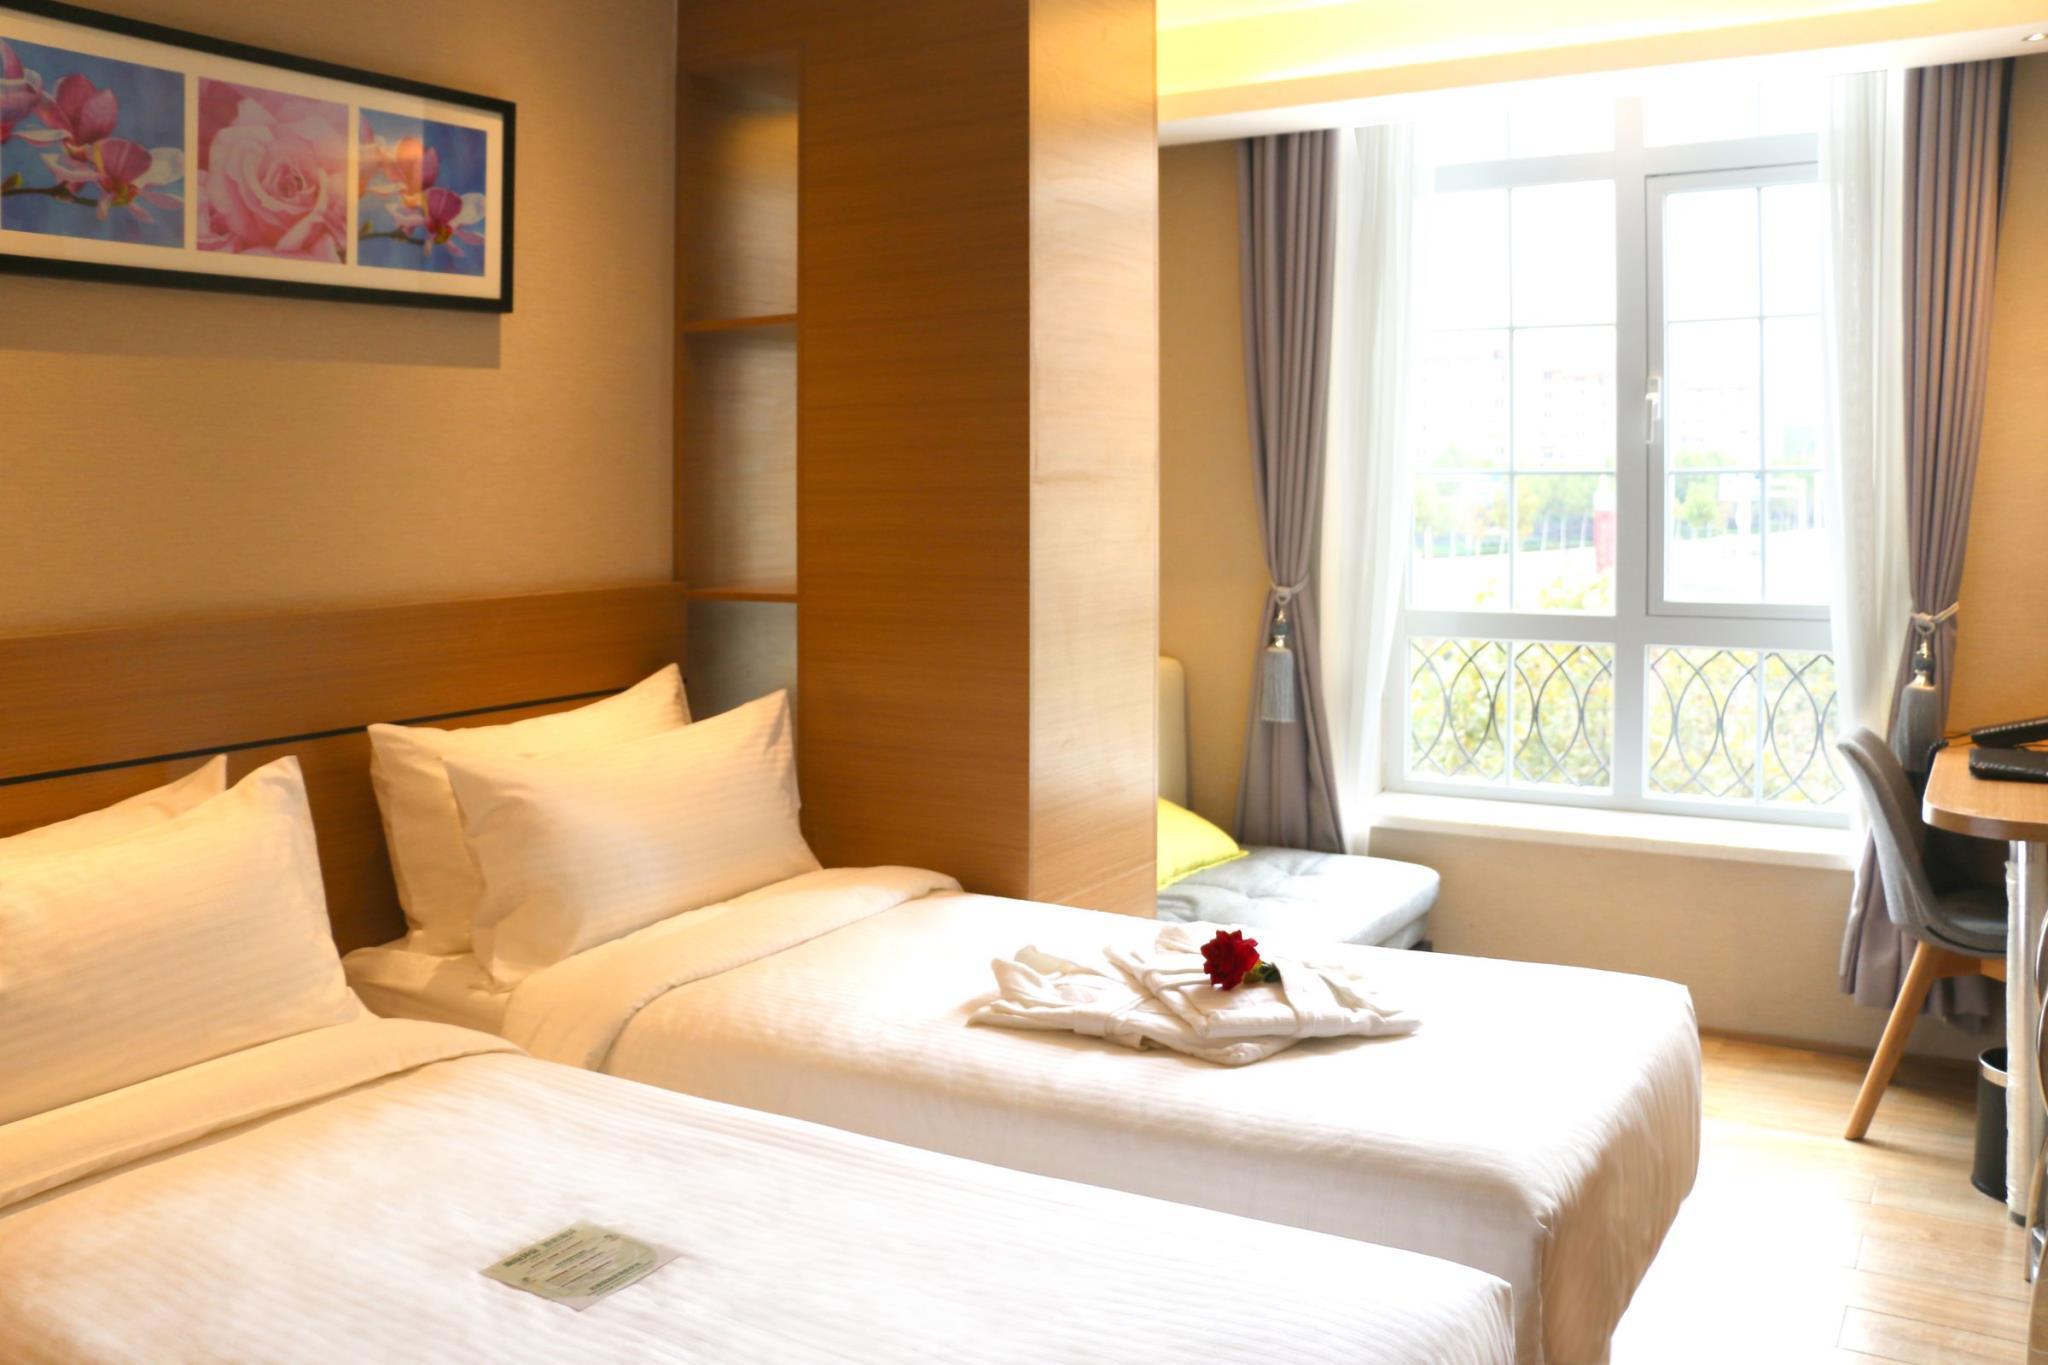 Bridal Tea House Hotel Yantai Zhi Fu, Yantai